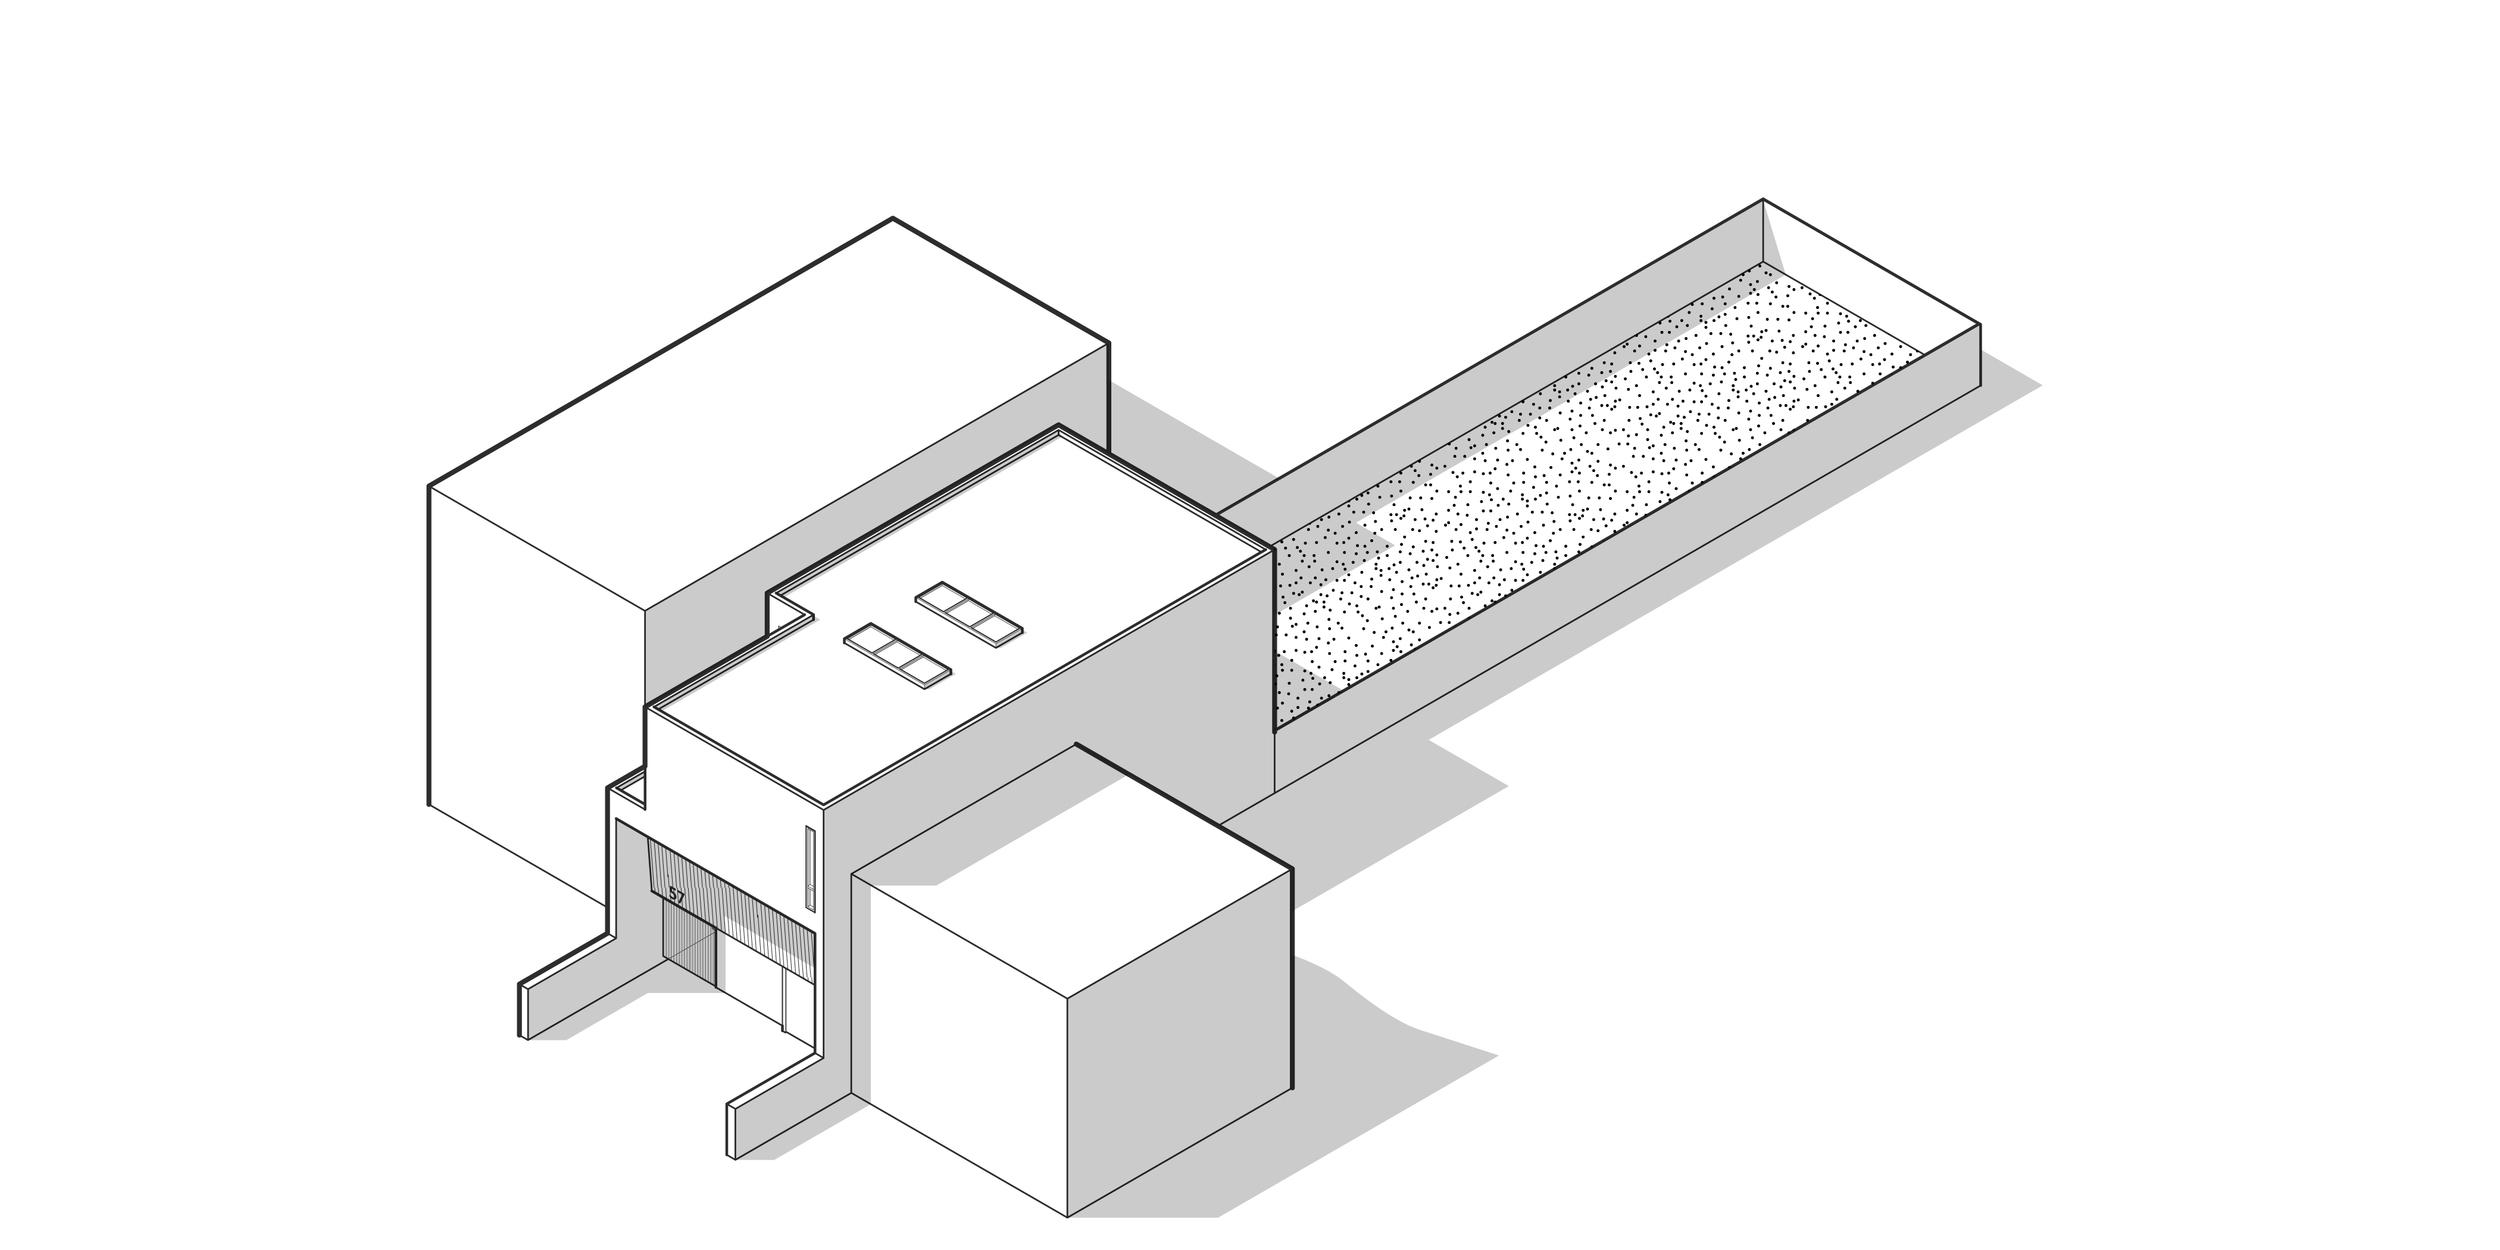 57_Highland-160413-Diagram-11-01.jpg